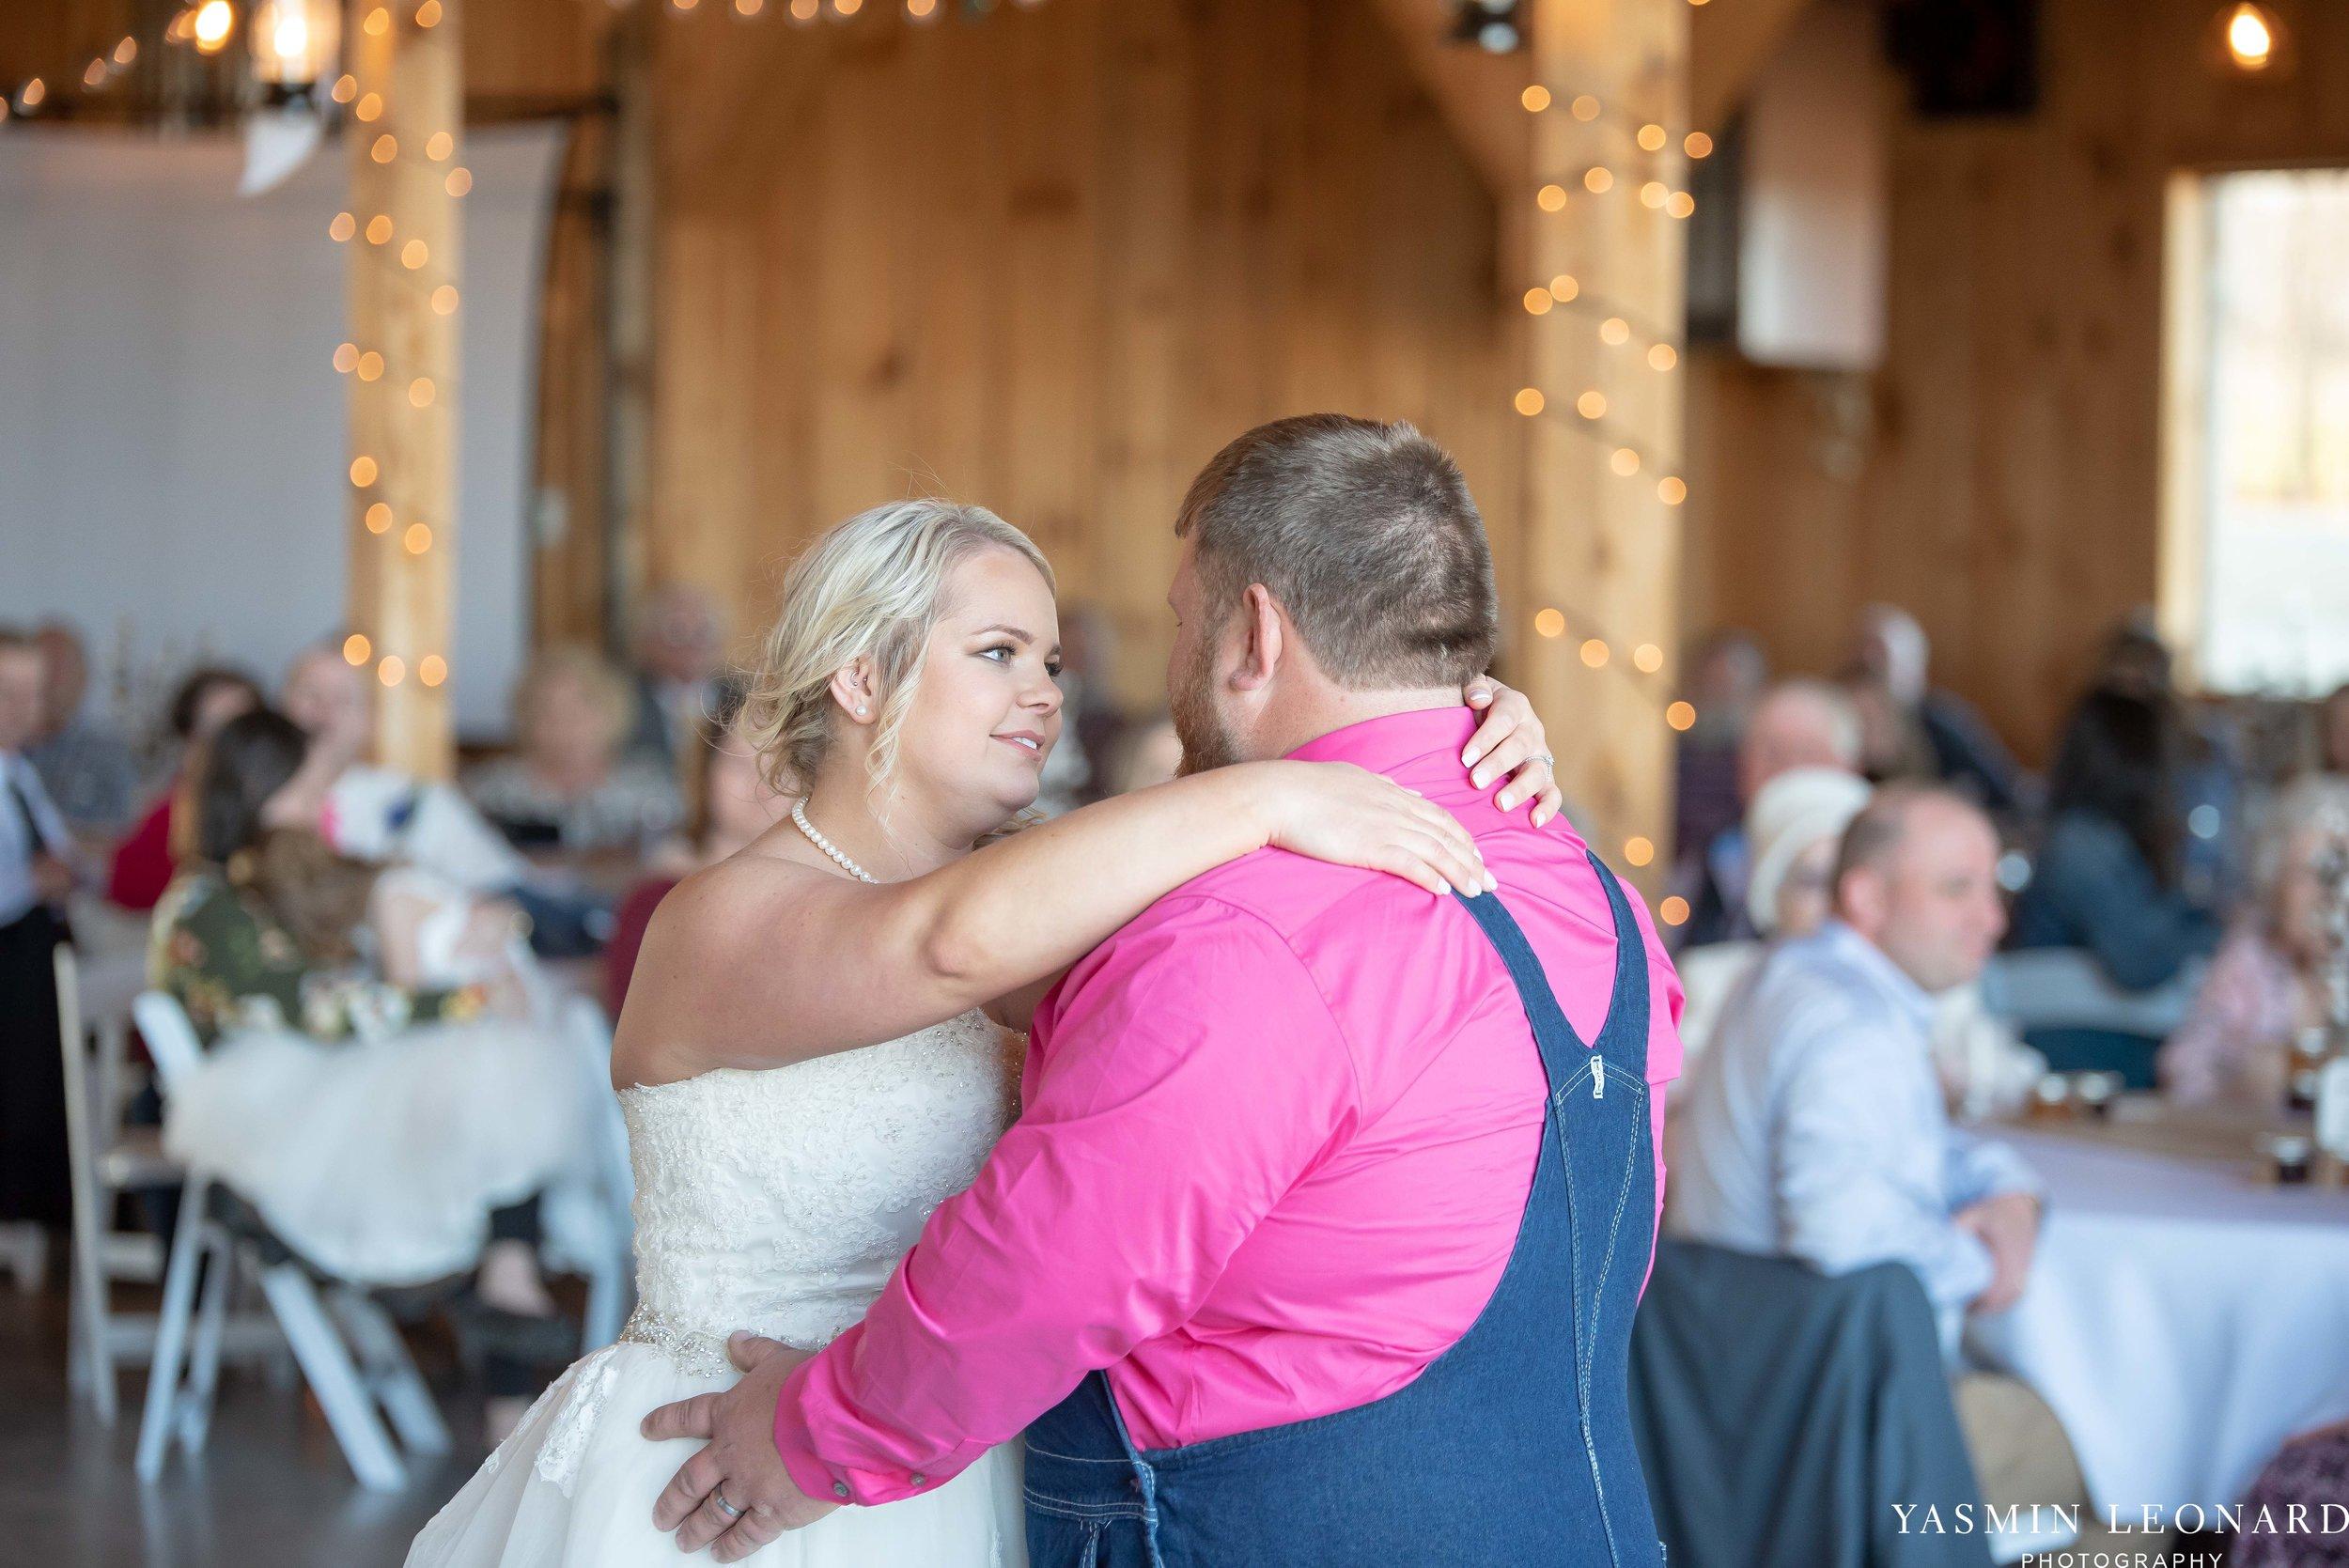 The Barn at Heritage Farm - Country Wedding - Pink and Blue Wedding - Barn Wedding - Outdoor Wedding - Cotton and Wheat Decor - Groom in Bibs - Pink Bridal Colors - Yasmin Leonard Photography-25.jpg